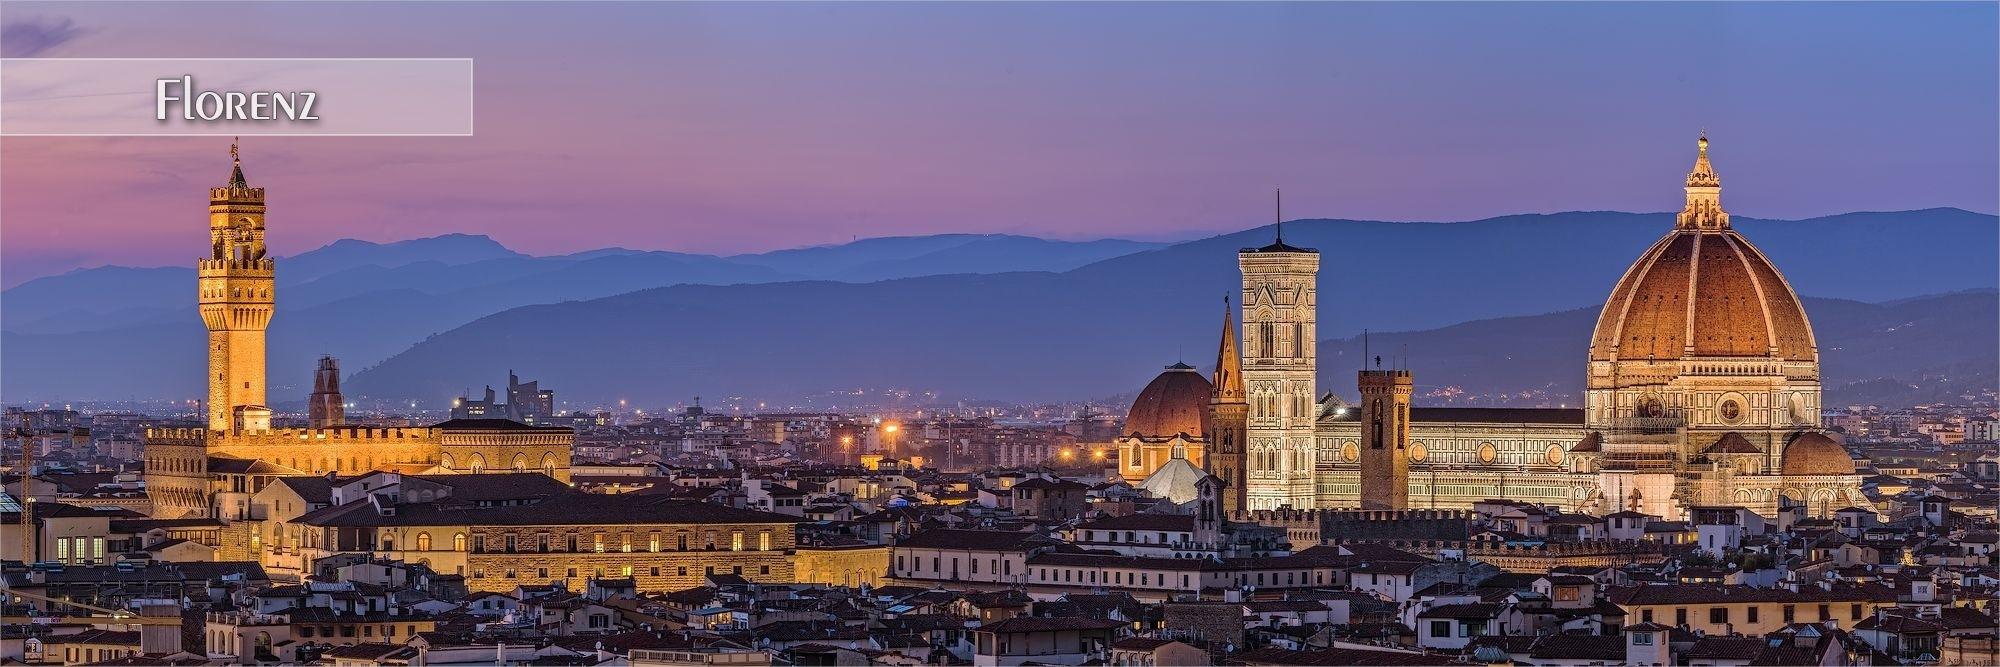 Bilder als Wandbild oder Küchenrückwand aus Florenz